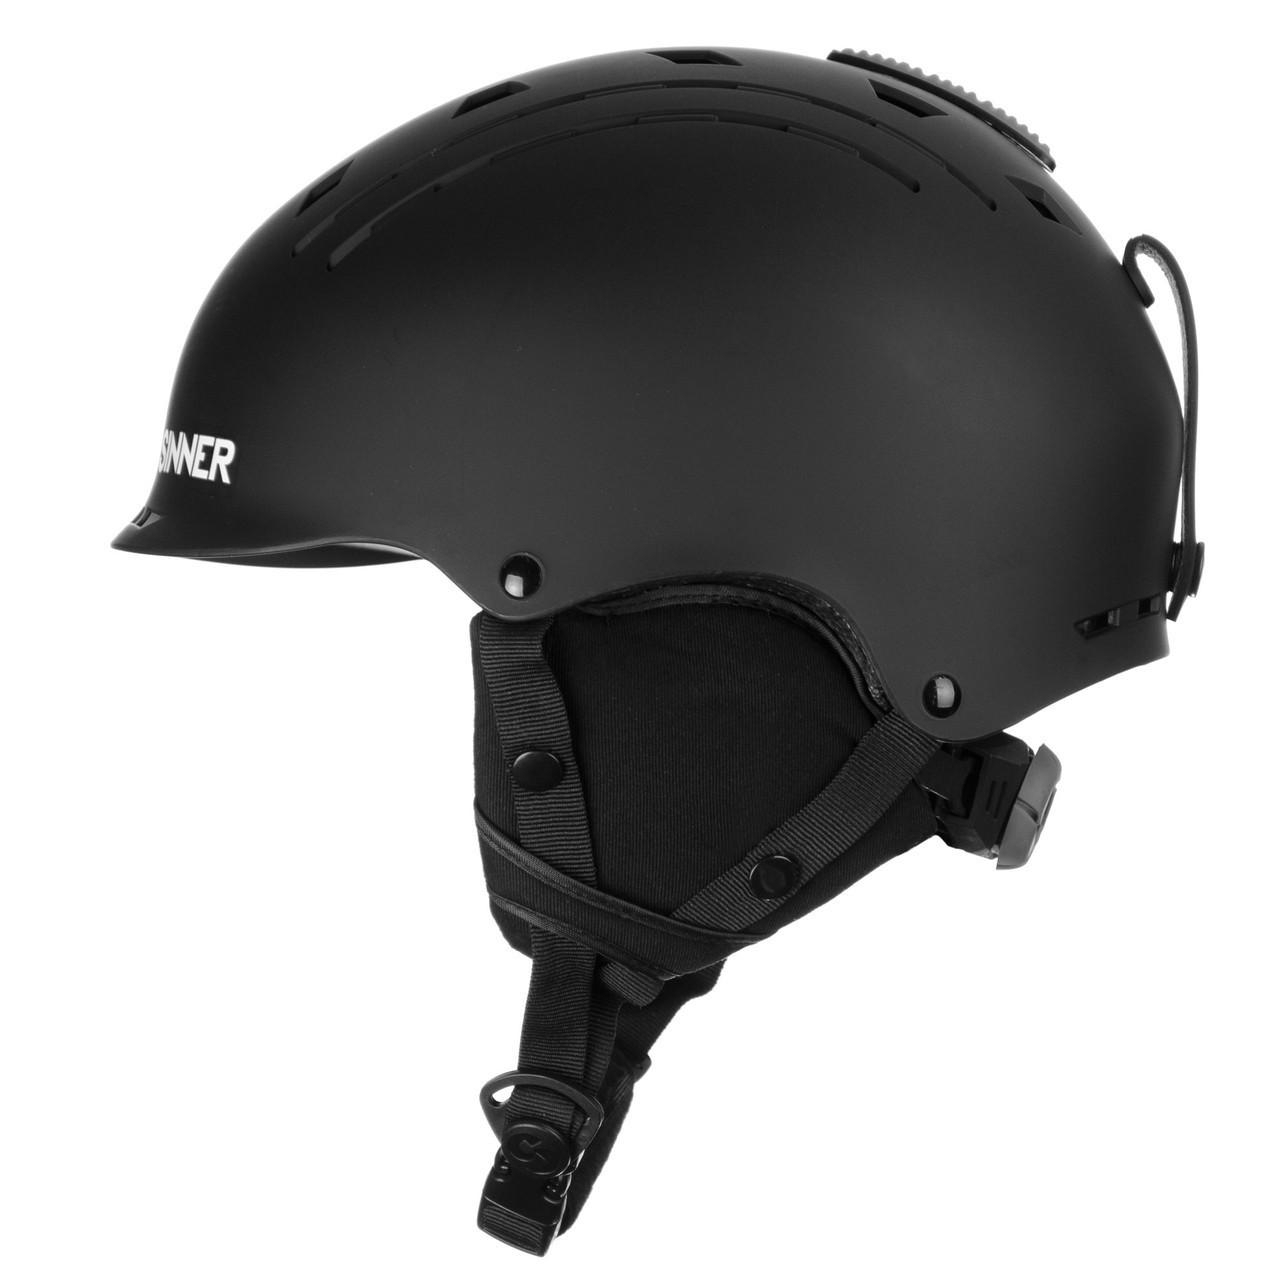 Шолом гірськолижний Sinner Pincher XS Matte Black (SIHE-136-10Z-54)